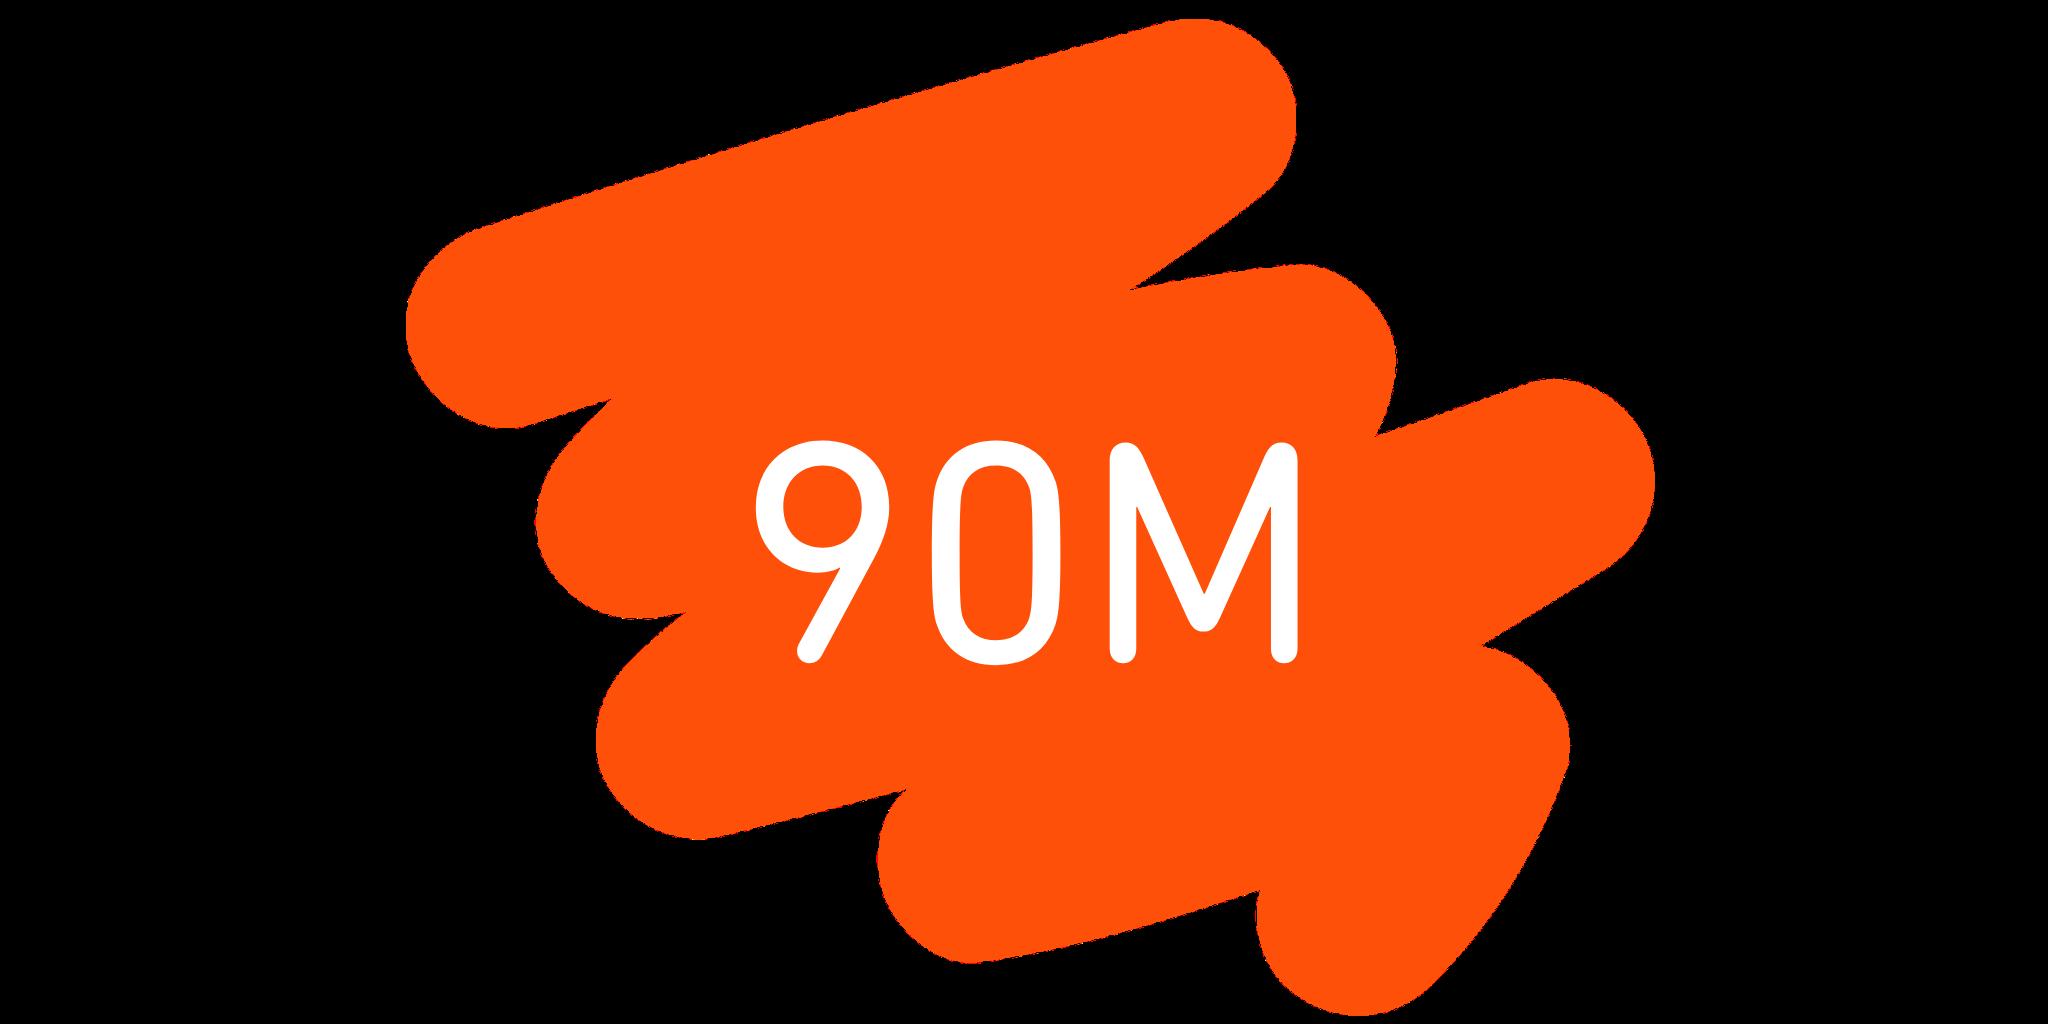 90M MUV stat (1)